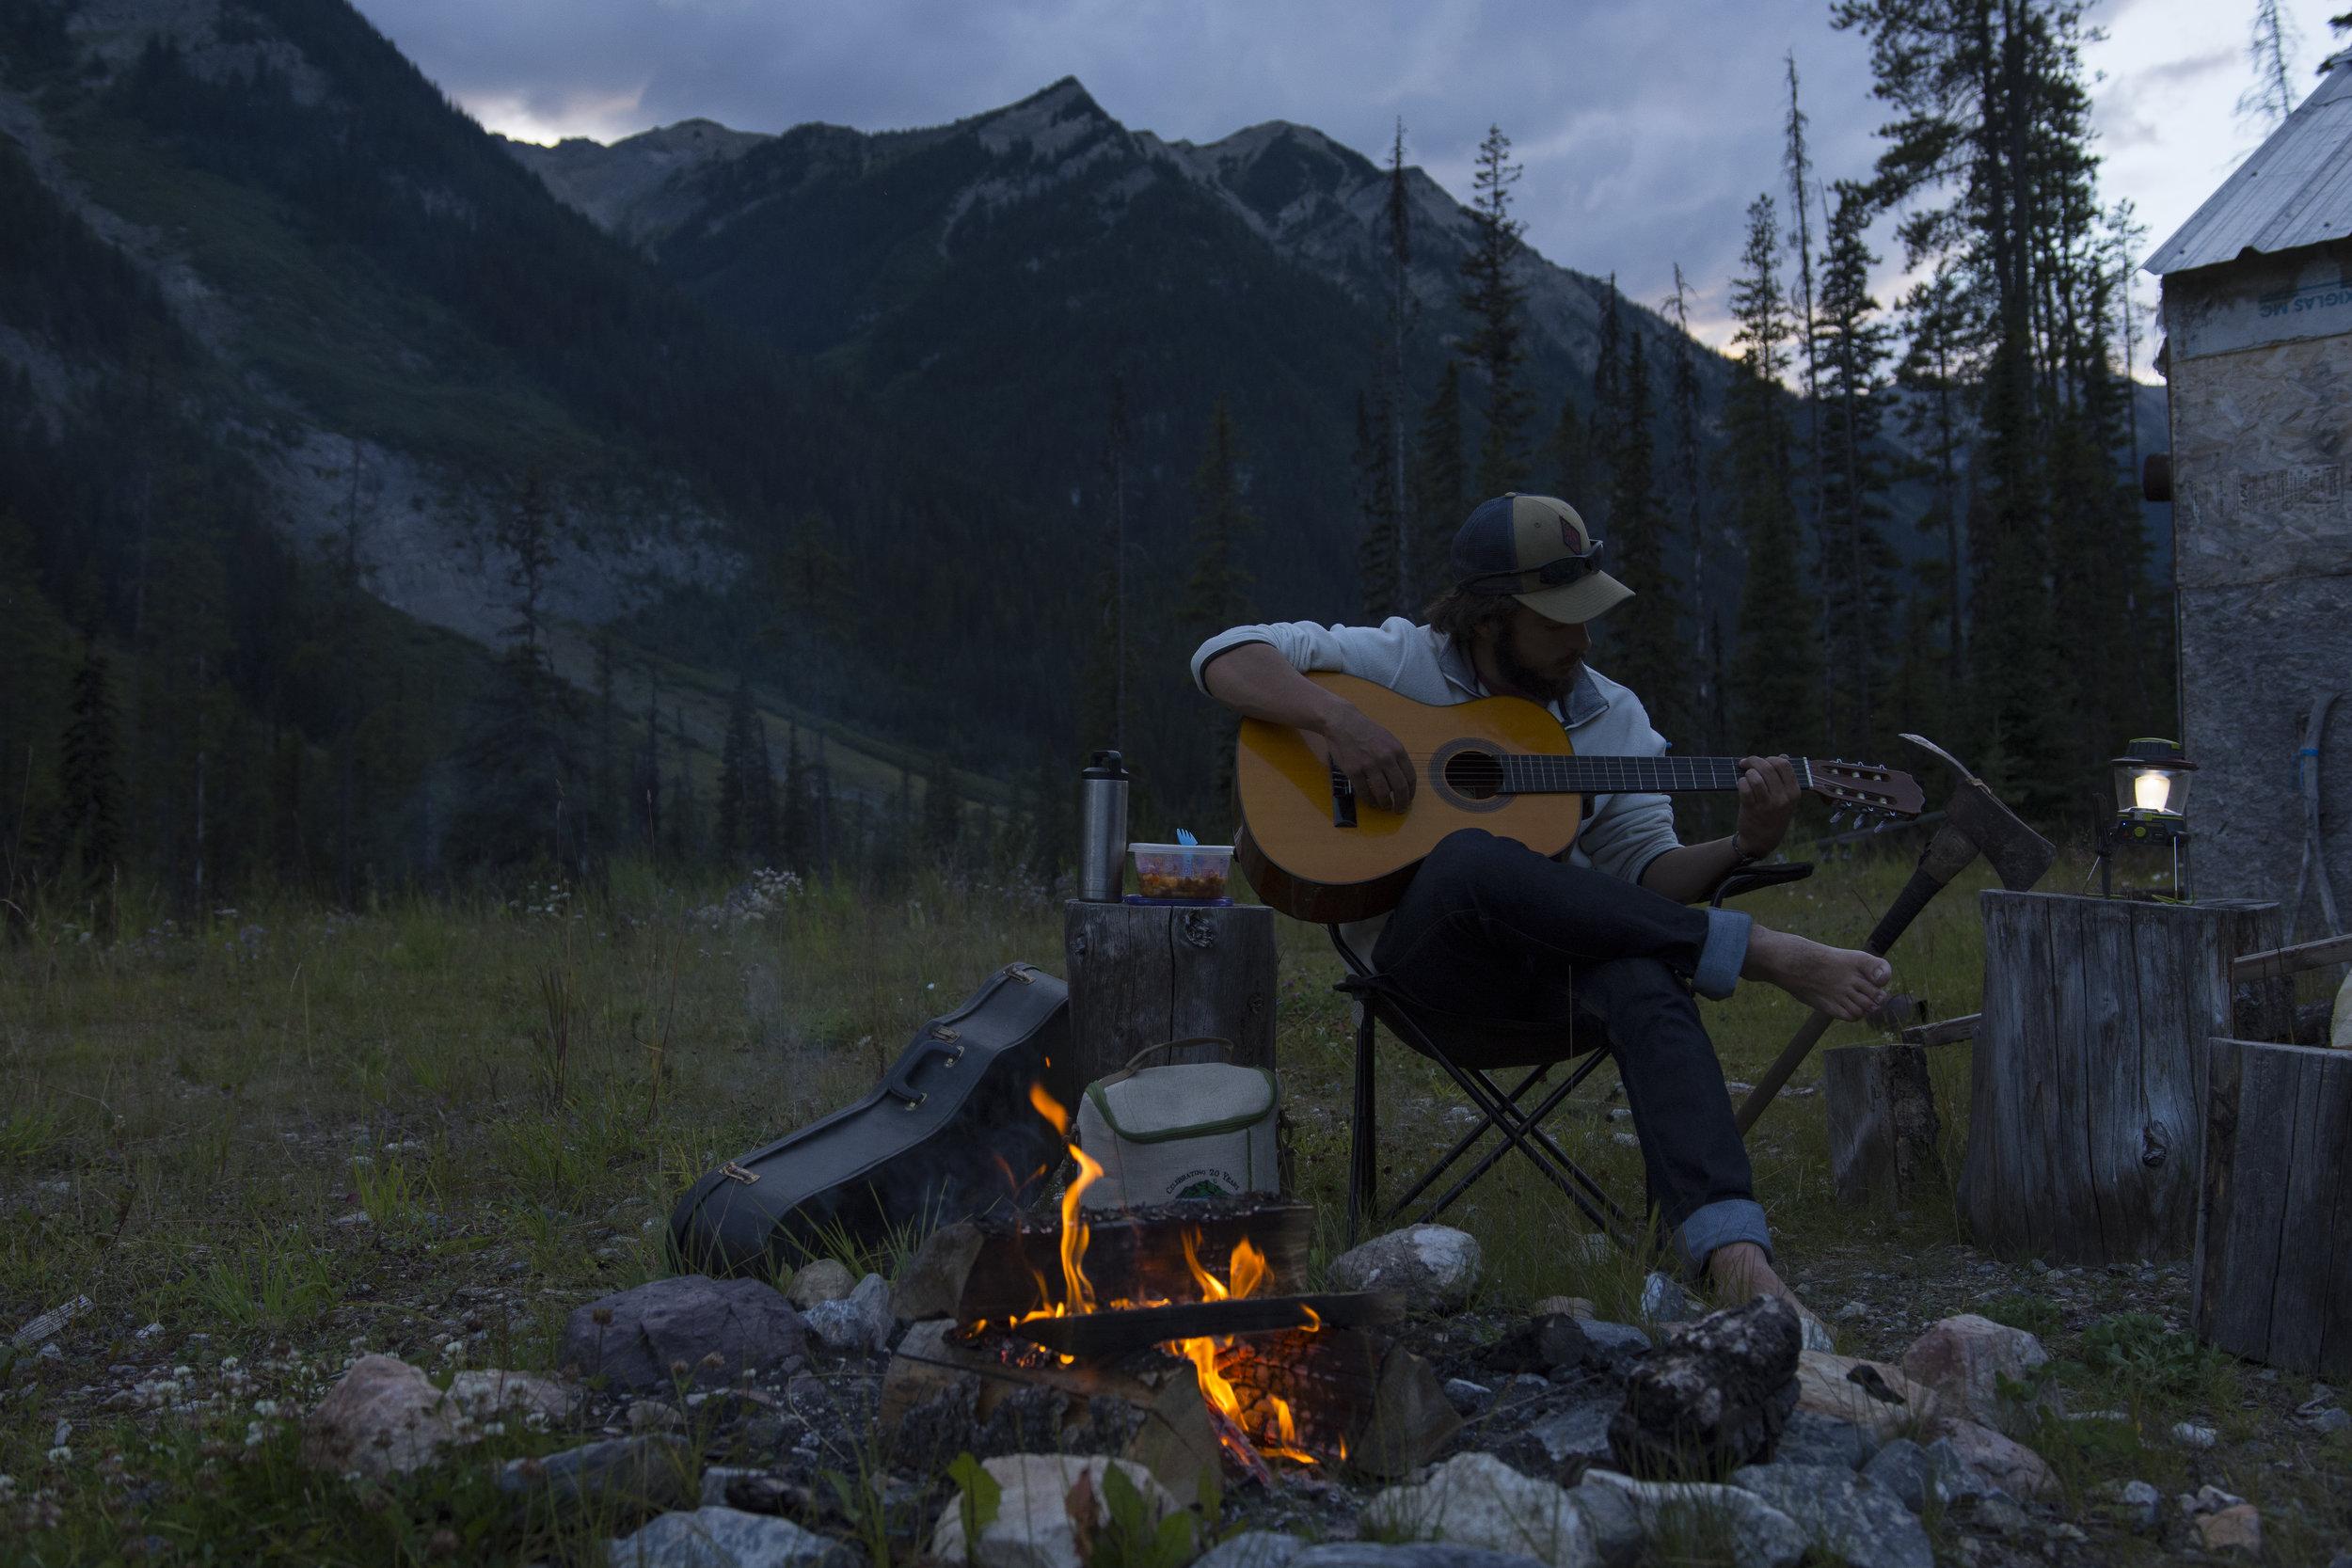 I've always responded very emotionally to music—sometimes it heals, sometimes it hurts. ( Kananaskis Country, Alberta )